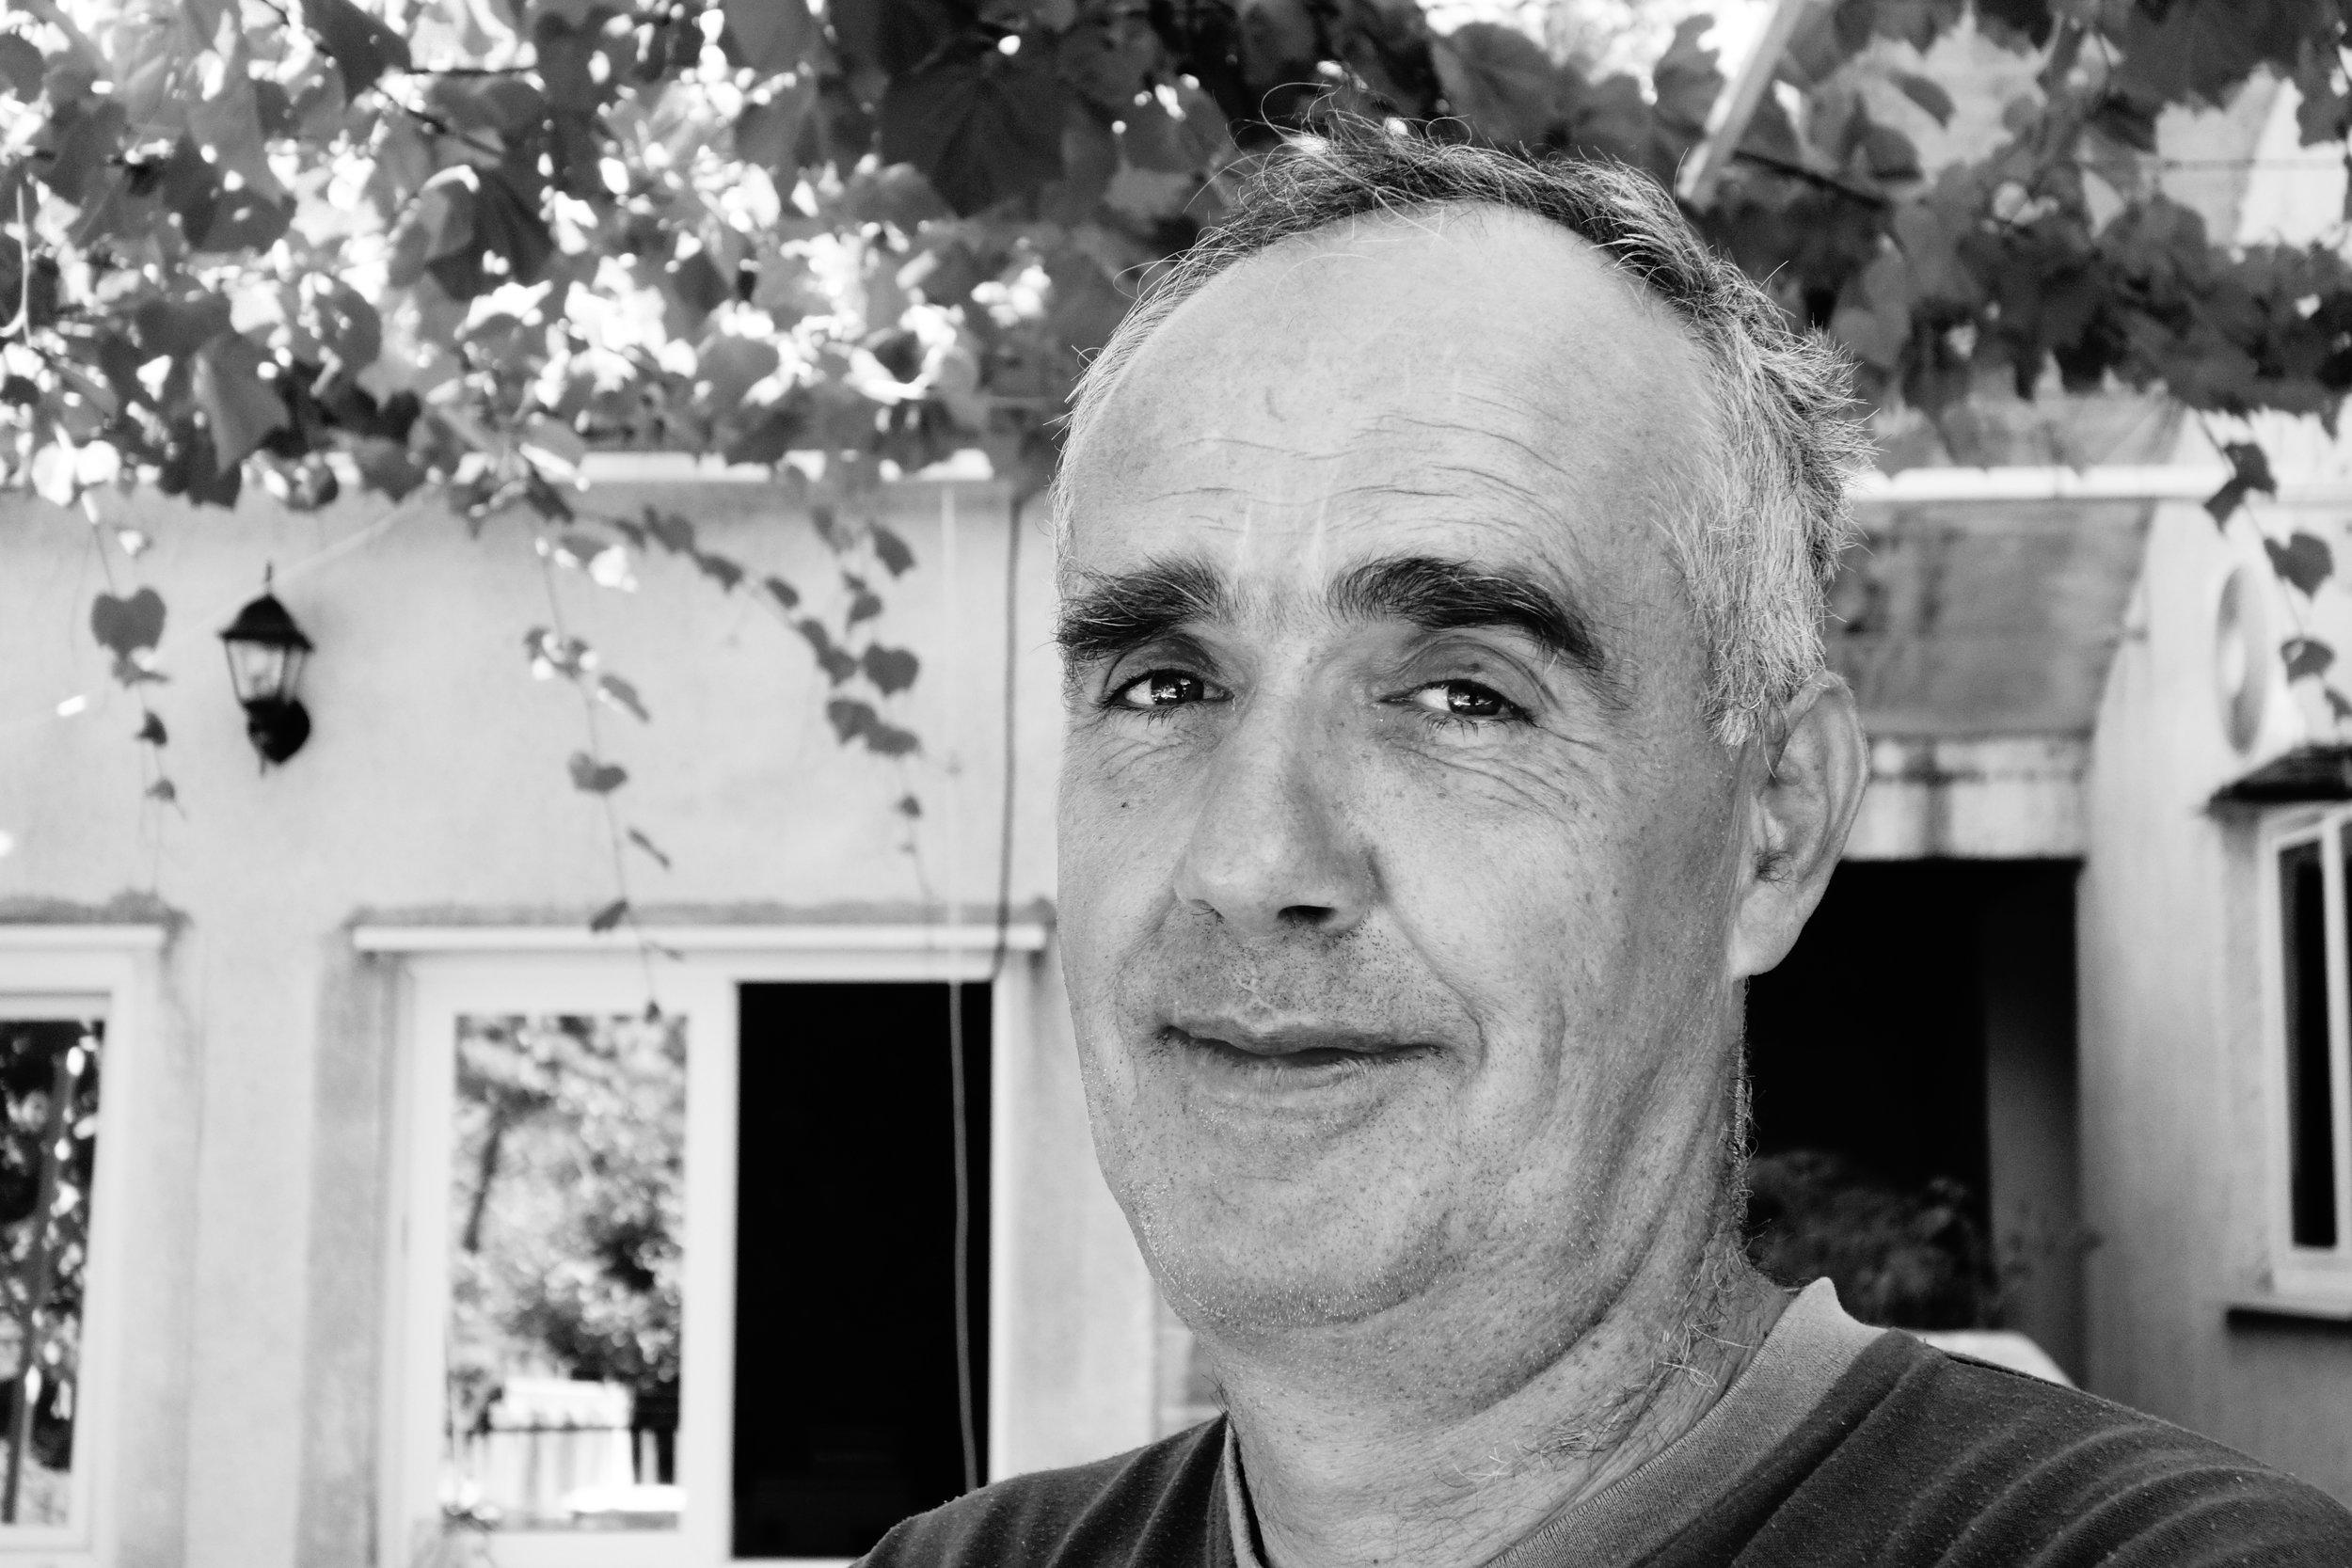 Ivo Pitarevic, portrait by Alessandro Molinari